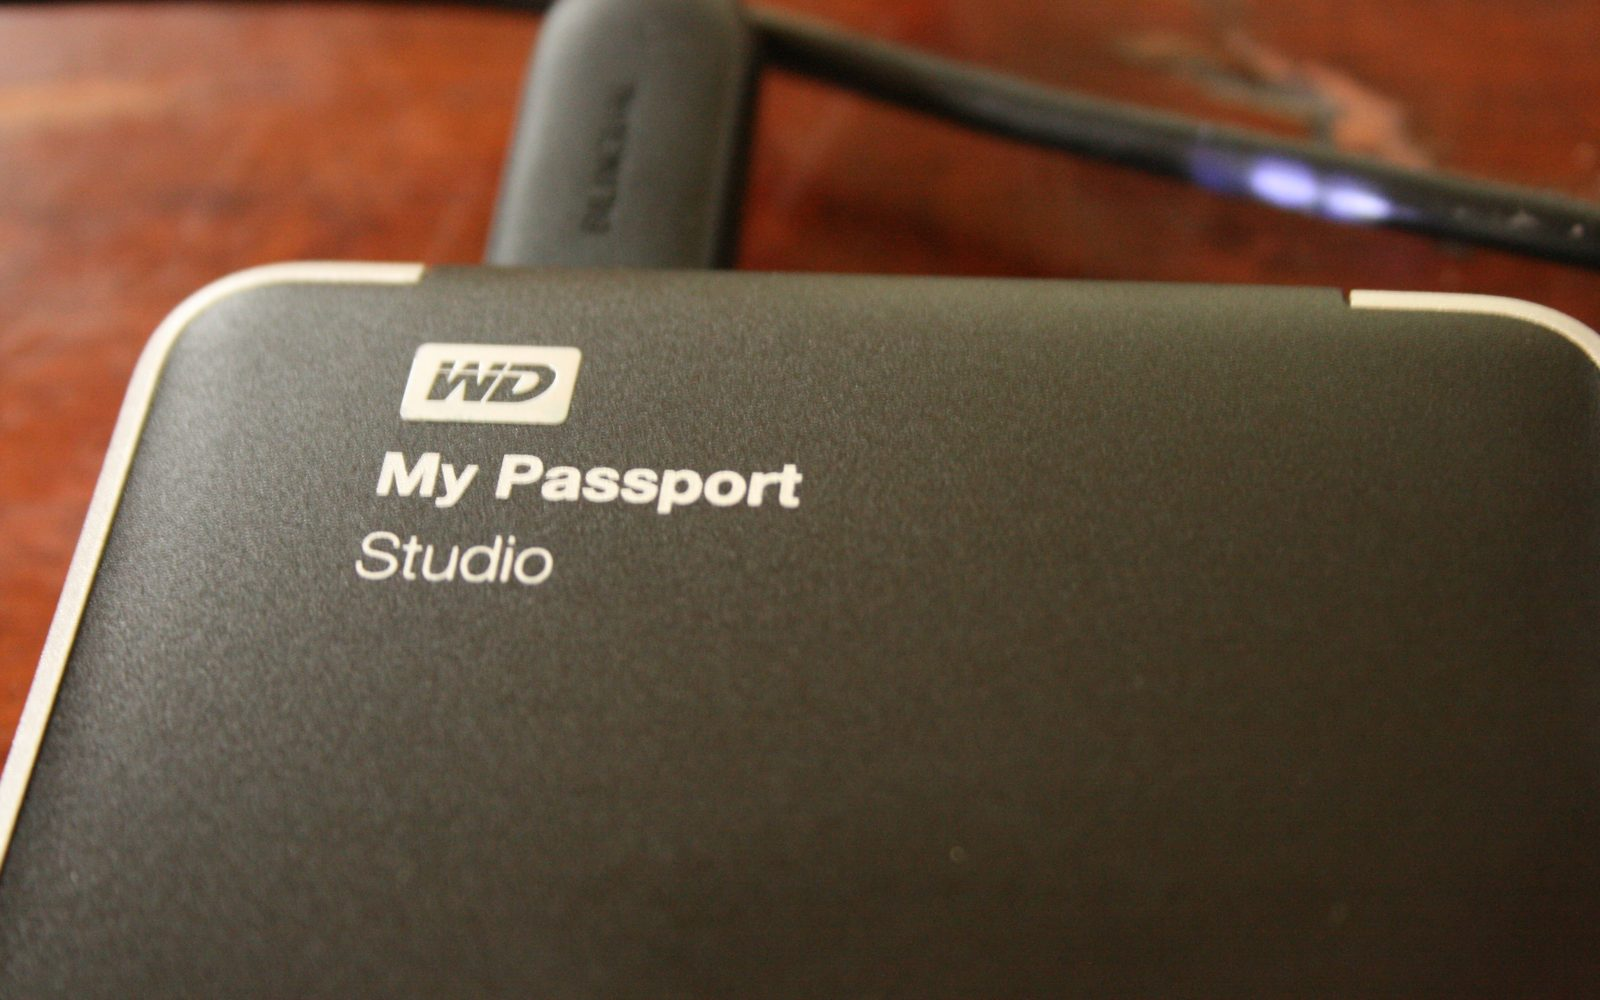 Review: Western Digital My Passport Studio portable hard